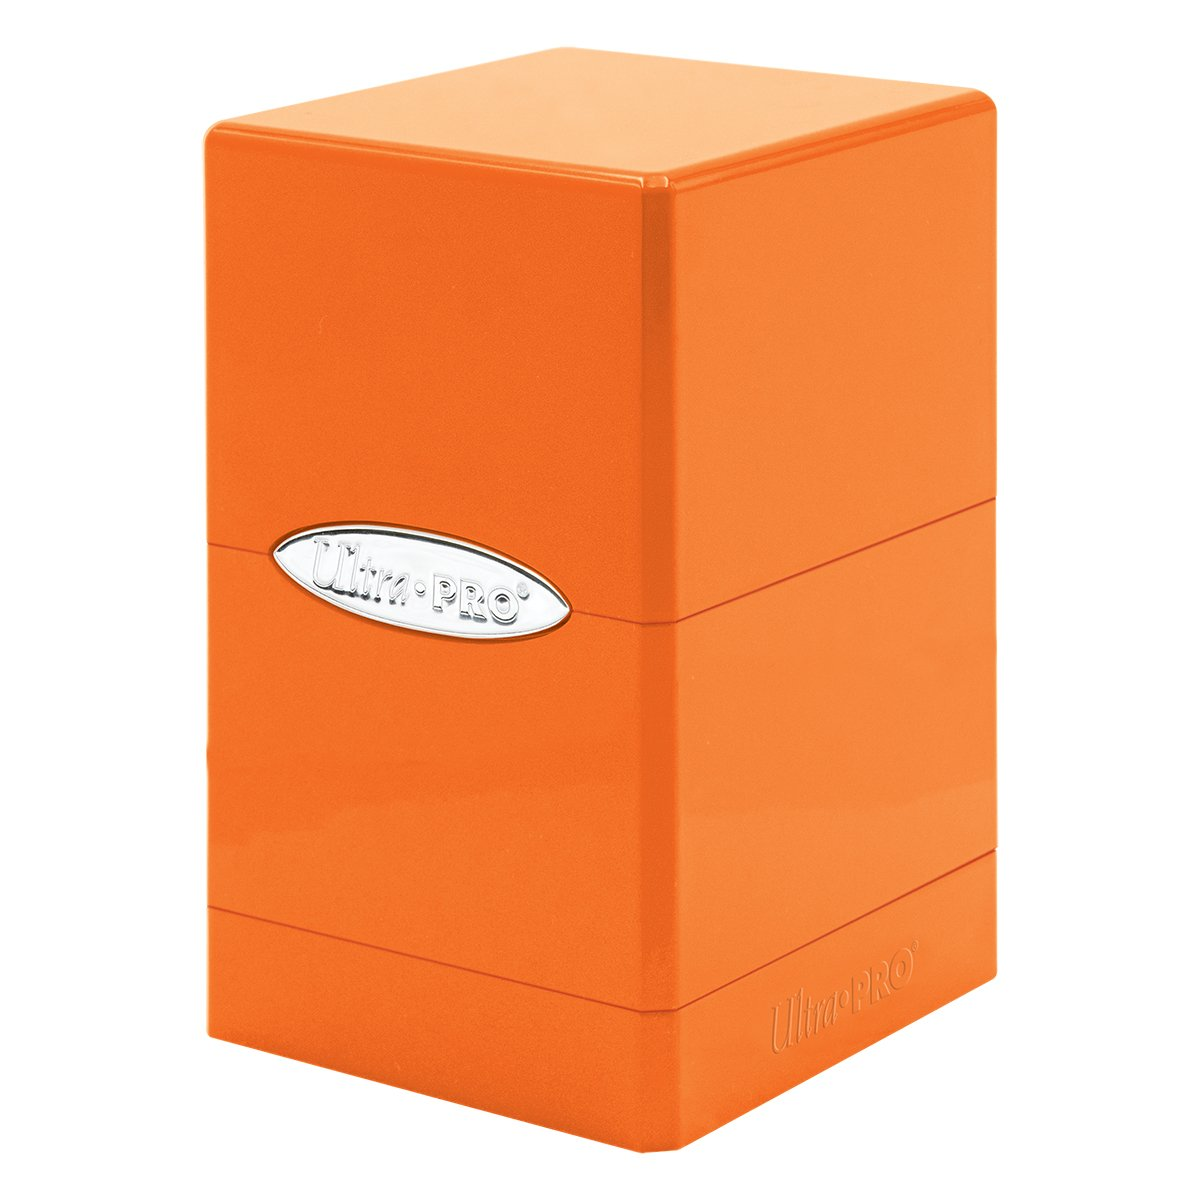 Ultra Pro - Orange Satin Tower